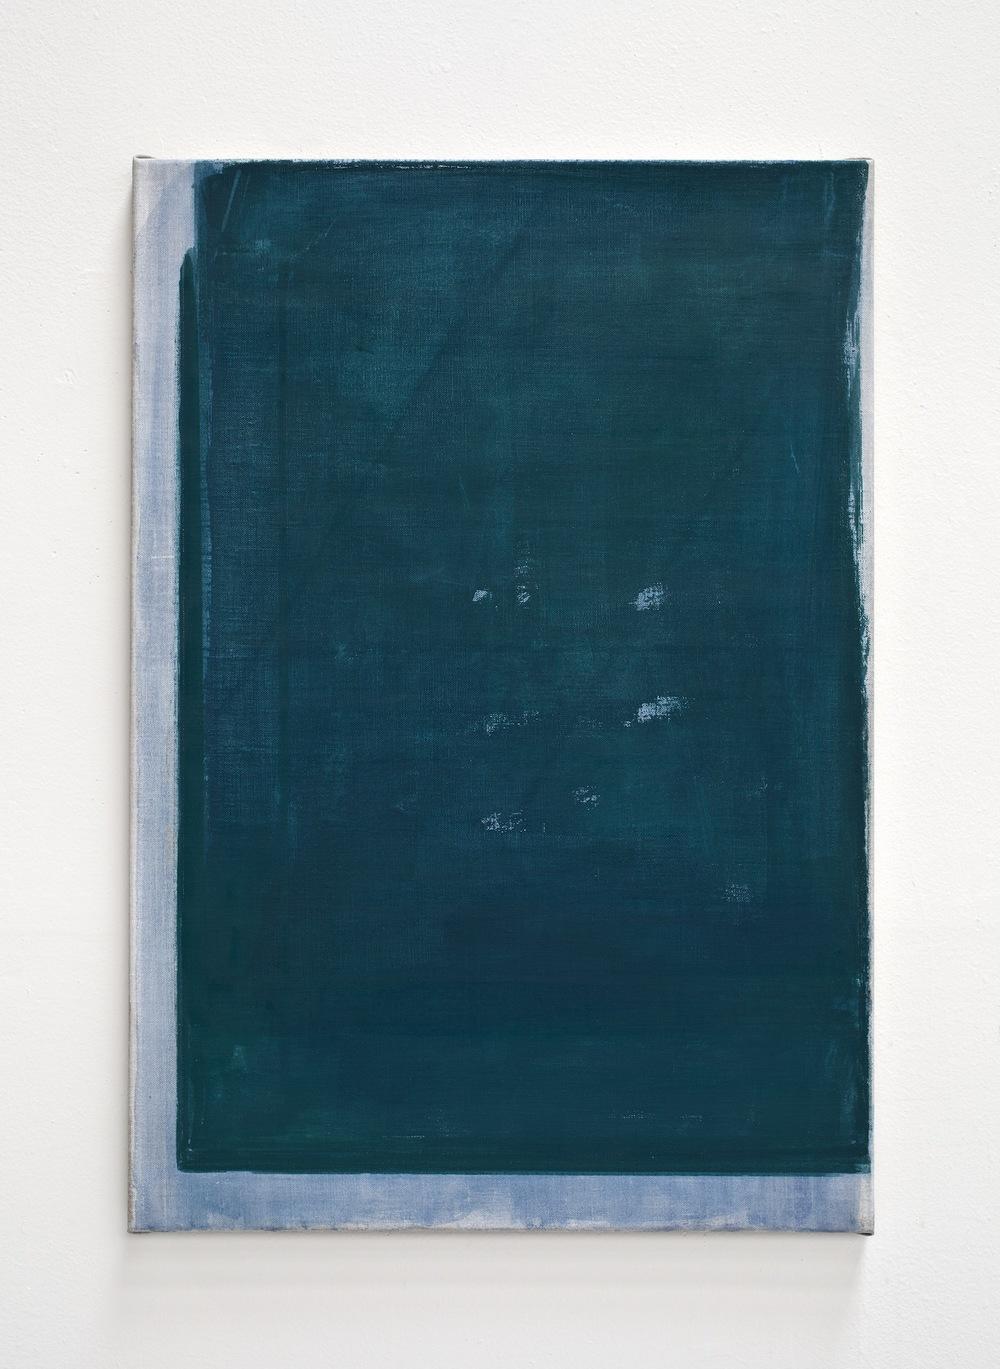 John Zurier, Postlude, 2014